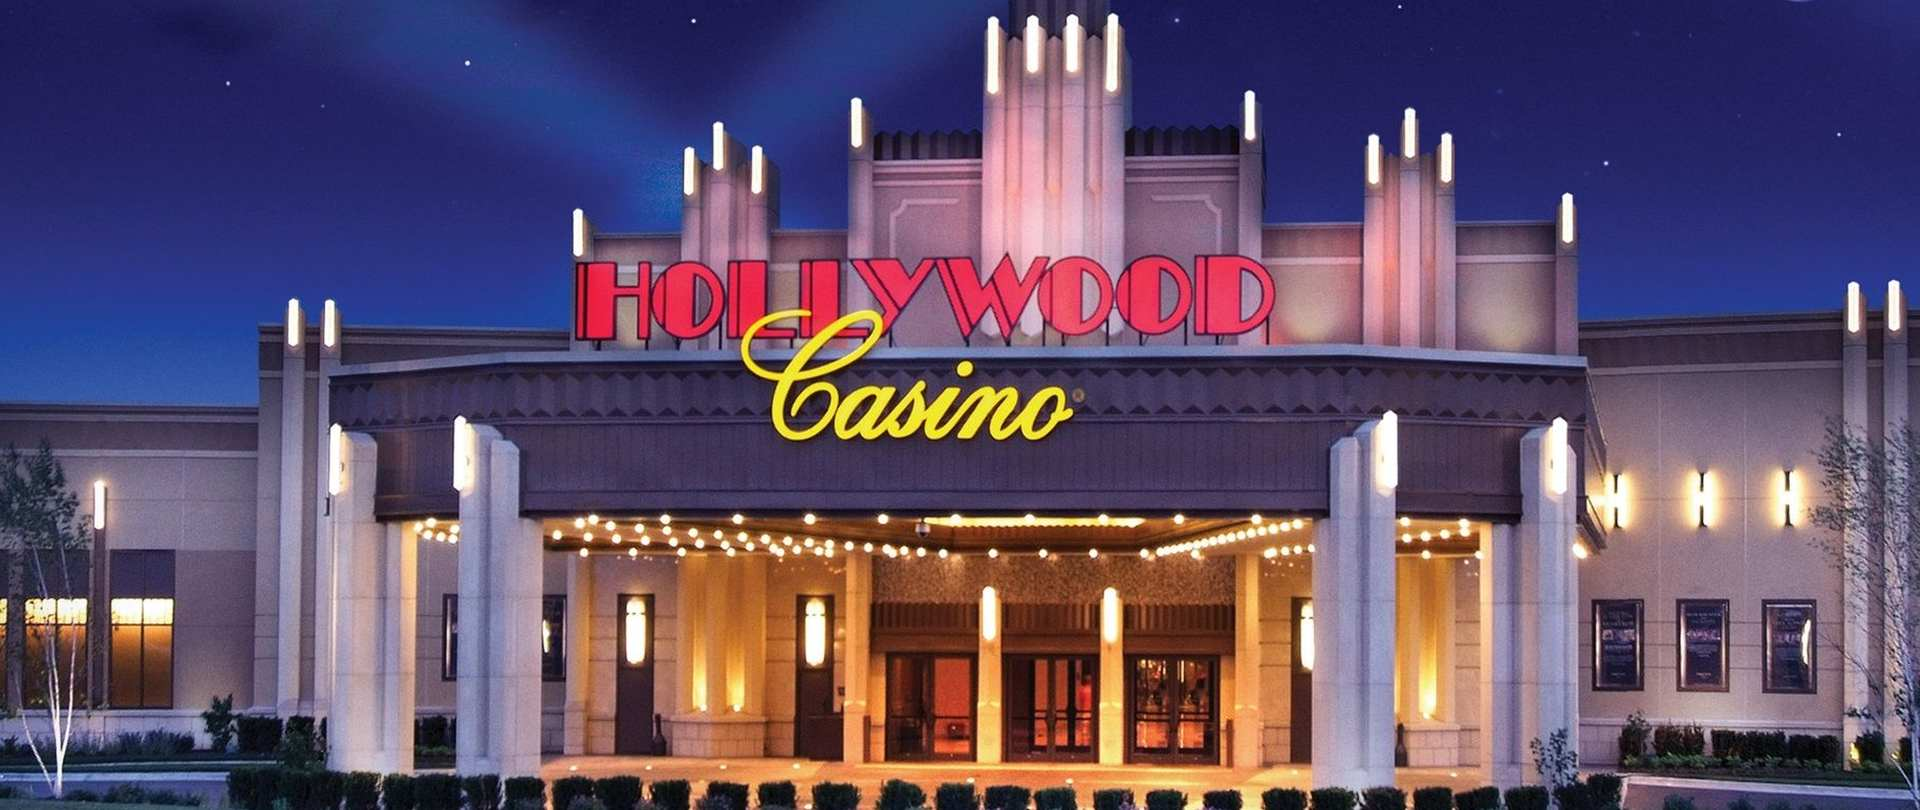 Hollywood casino hotel oriville casino